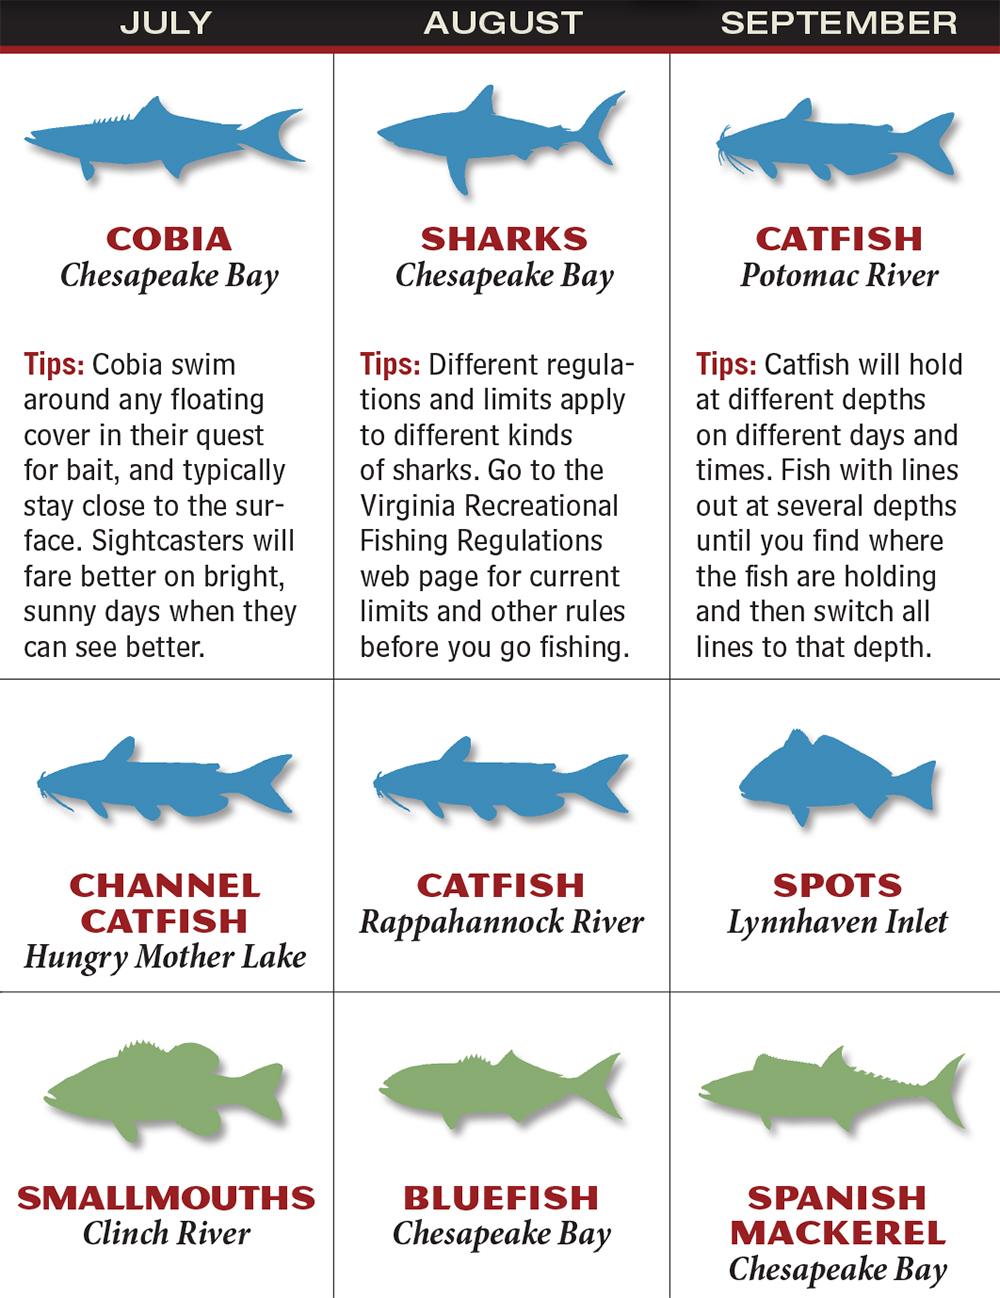 Freshwater fish maryland - Gafp_1602_021_va Jul_sep